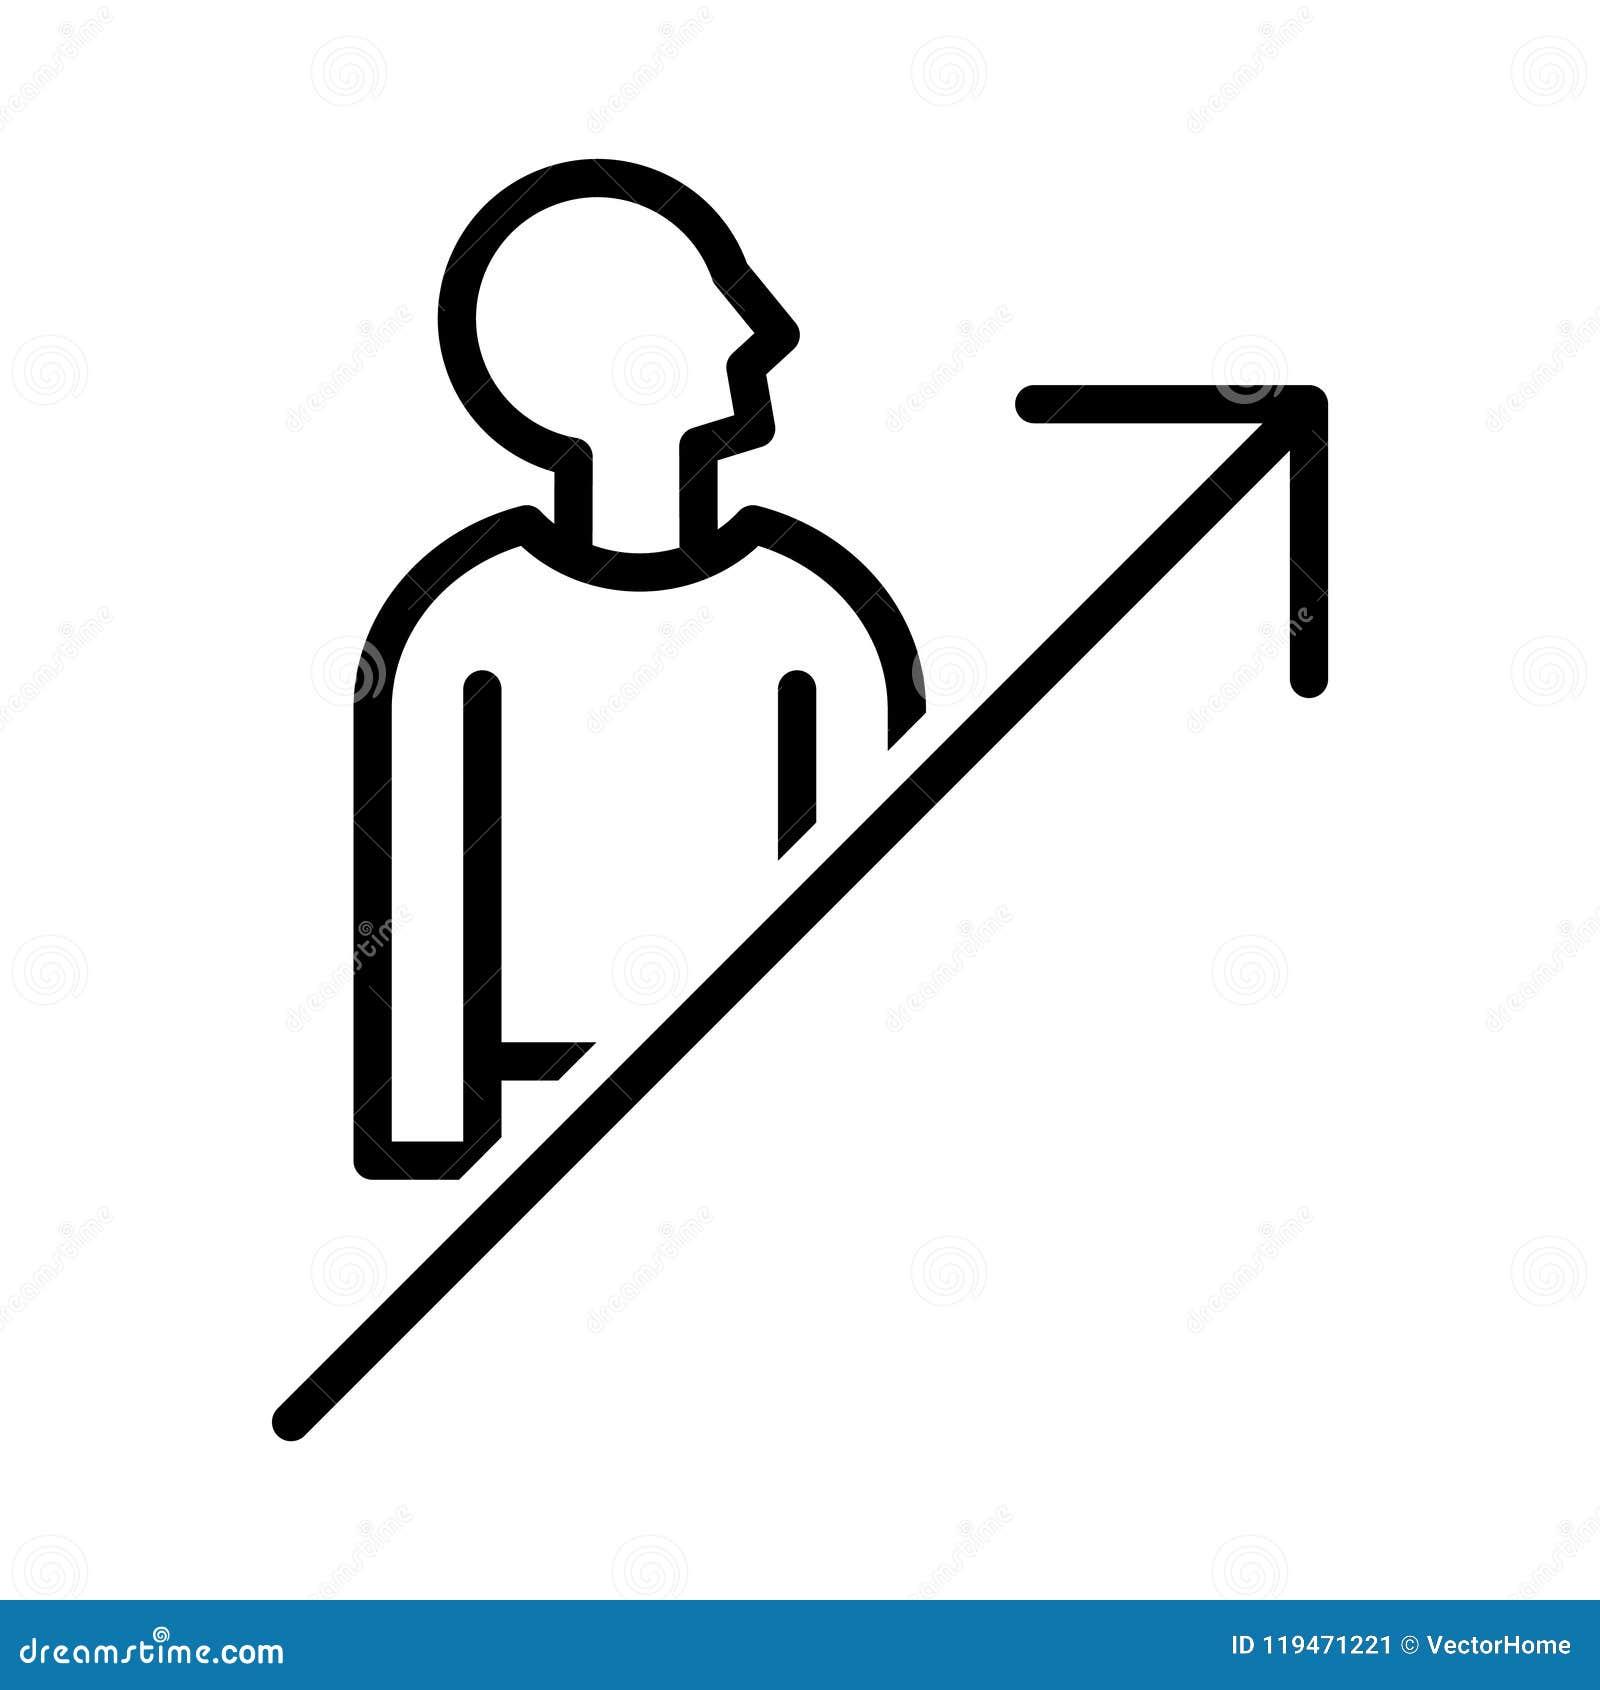 self improvement icon stock vector illustration of chart 119471221